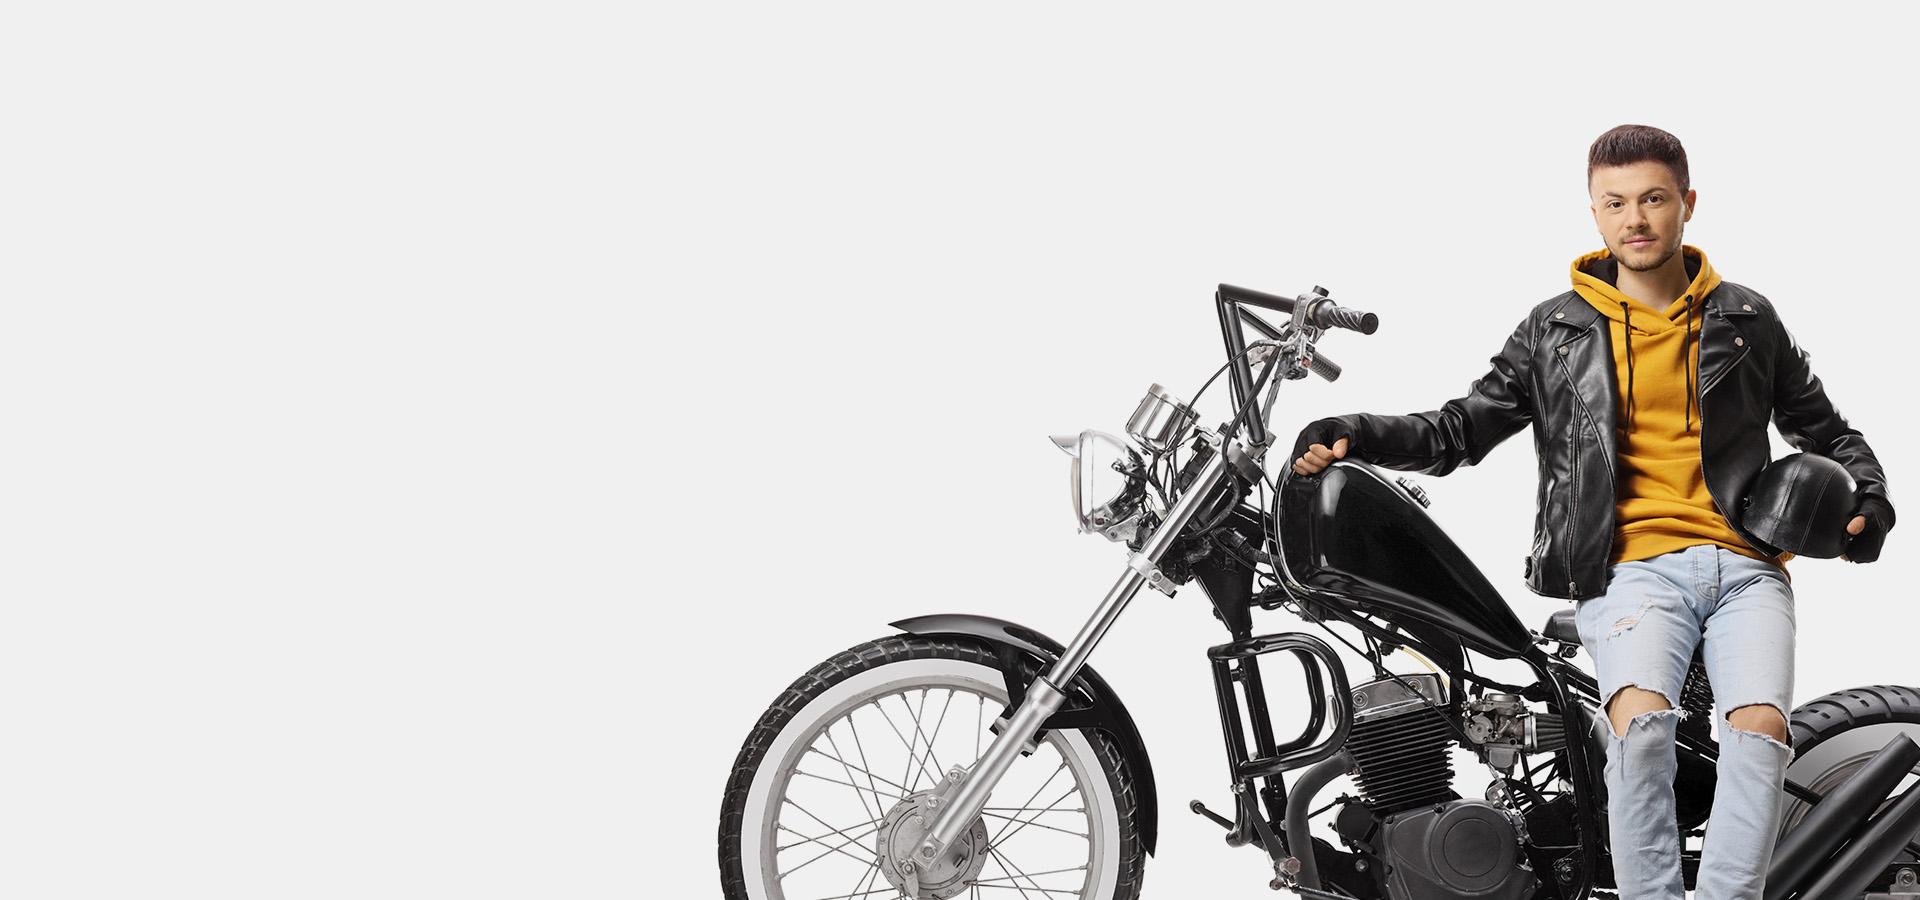 motocycle fans pleasure bg